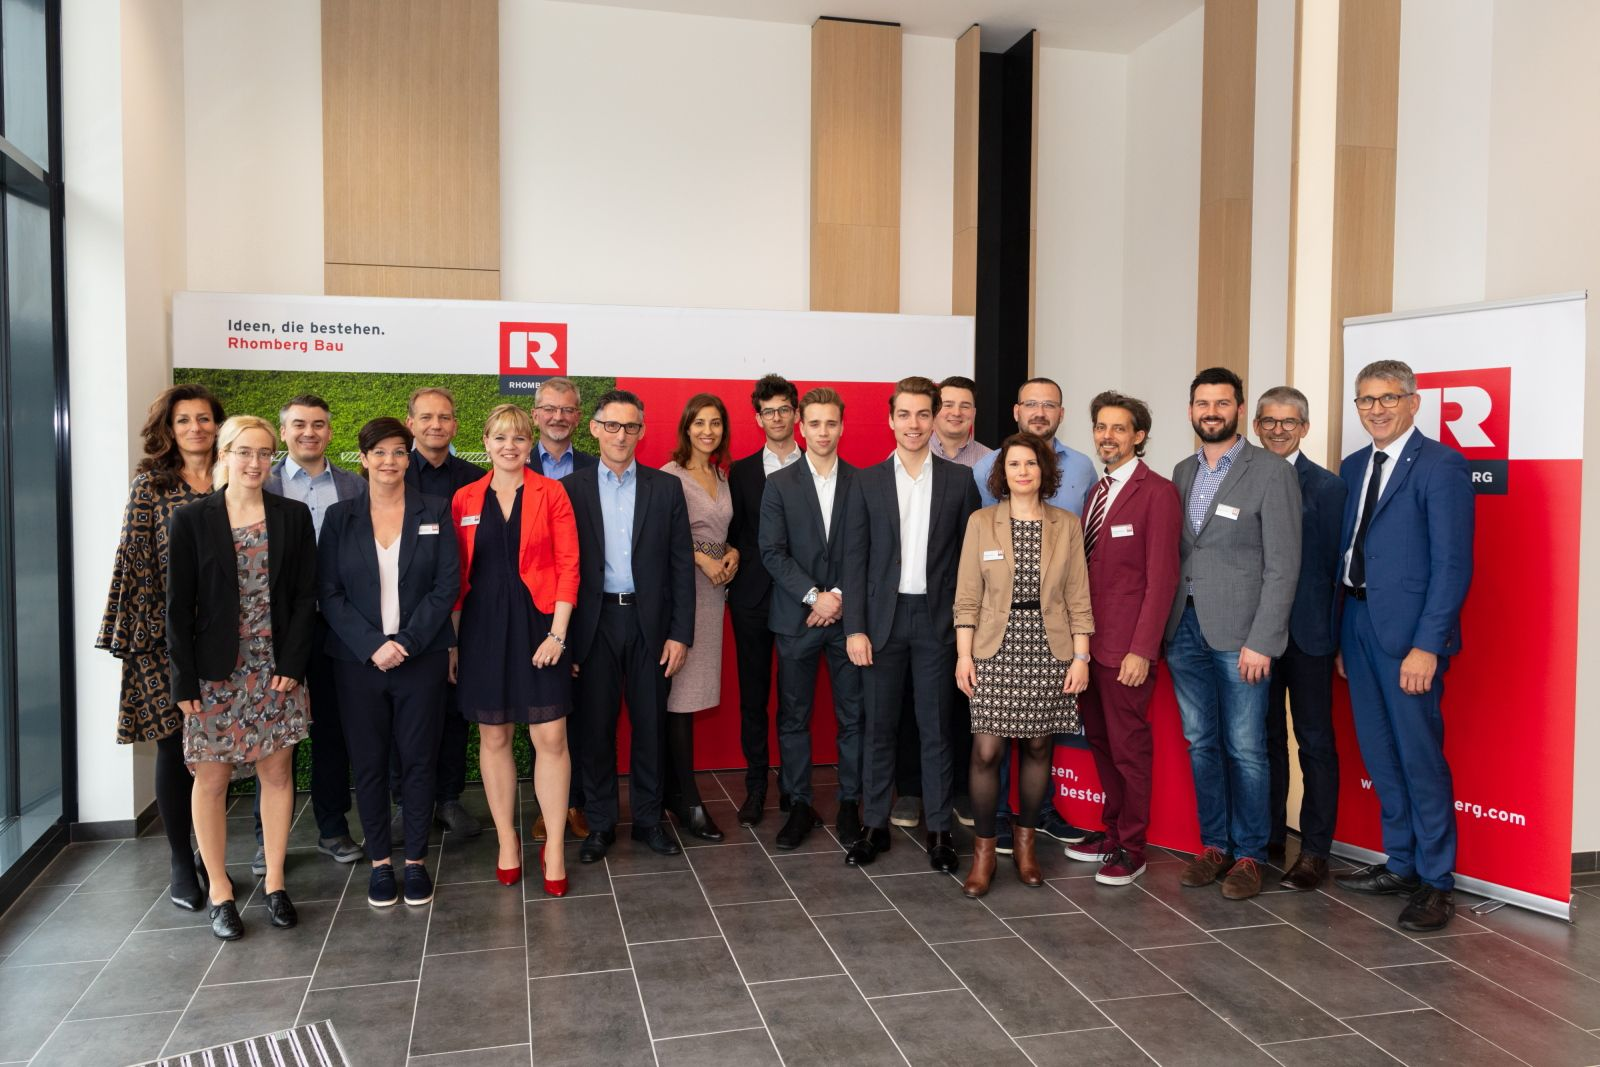 Rhomberg Bau eröffnet neues Büro in Wien